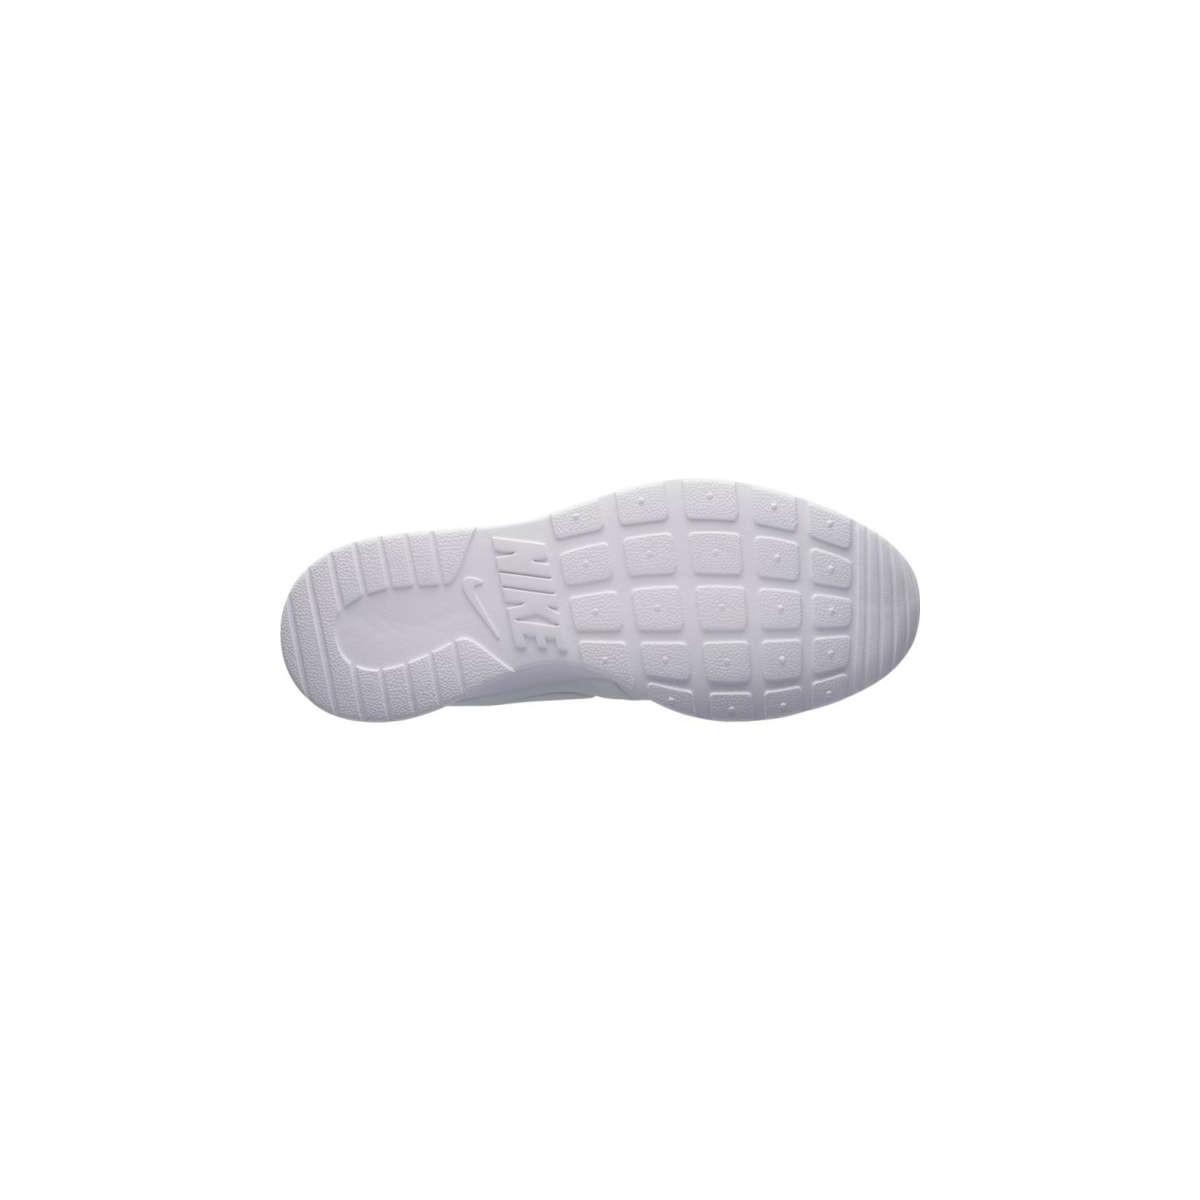 Nike mujer tanjun 917537 zapatillas premium 004 plateadas zZHqza